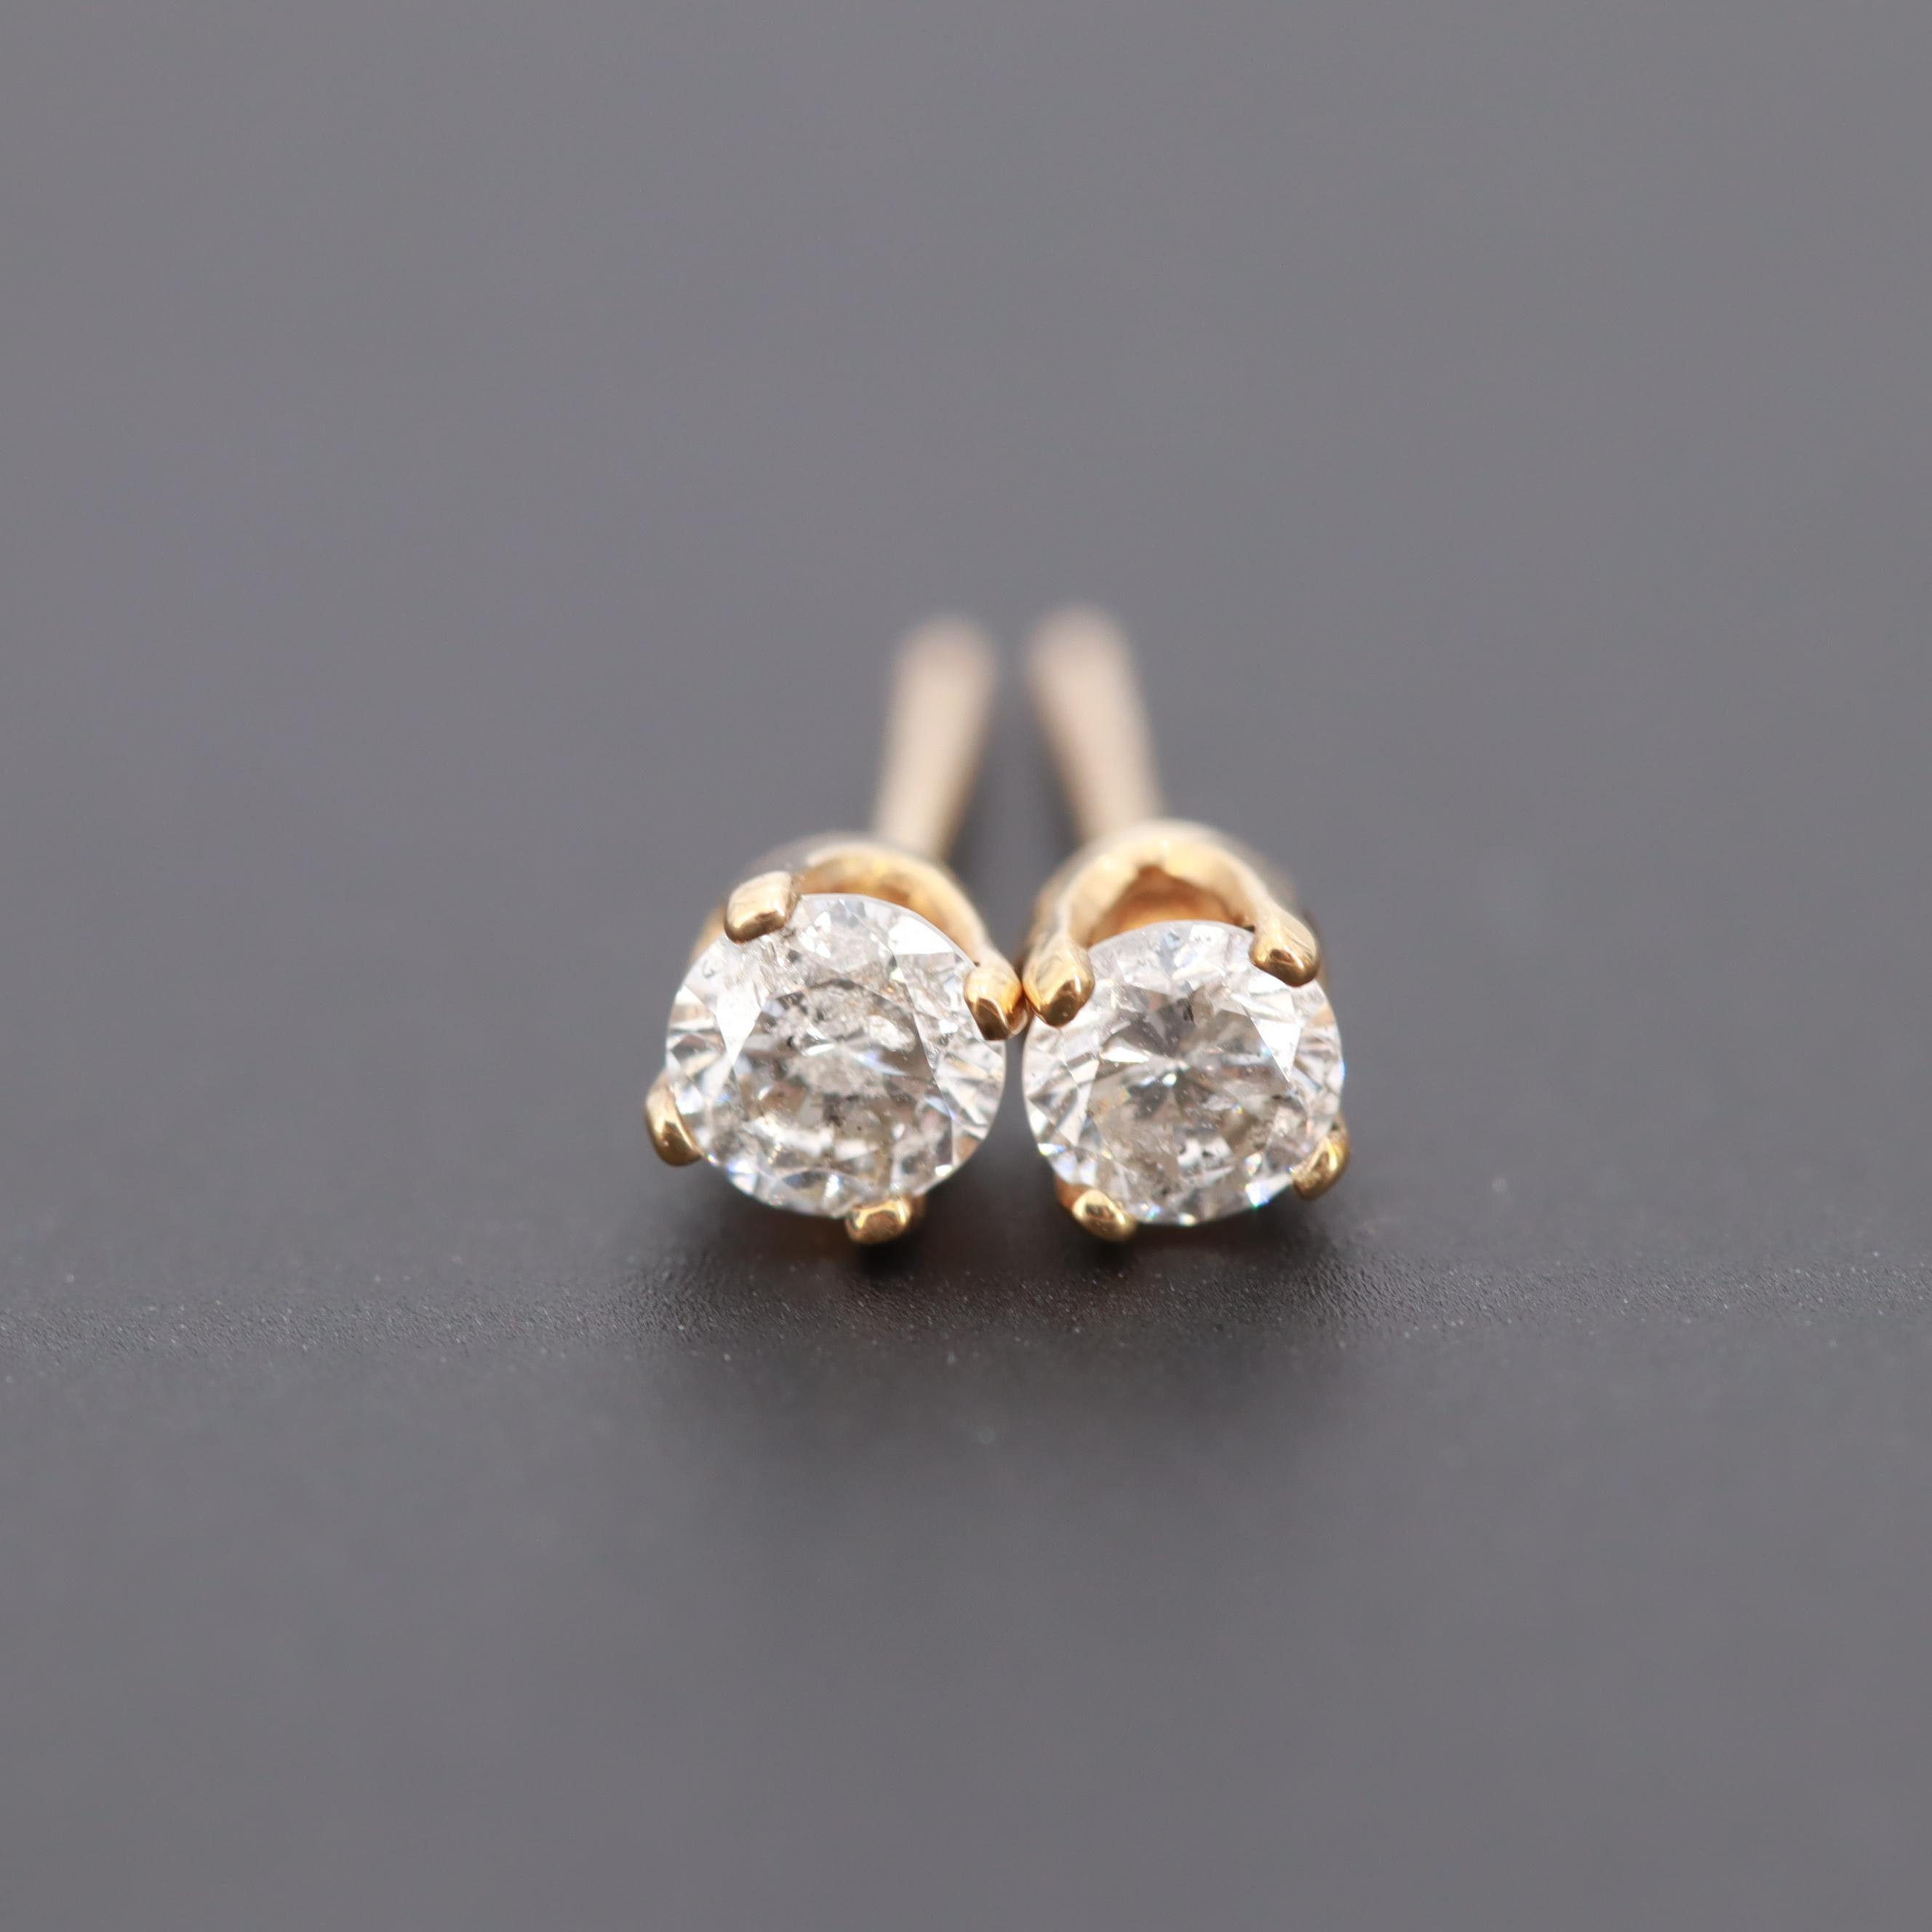 10K Yellow Gold Diamond Stud Earrings